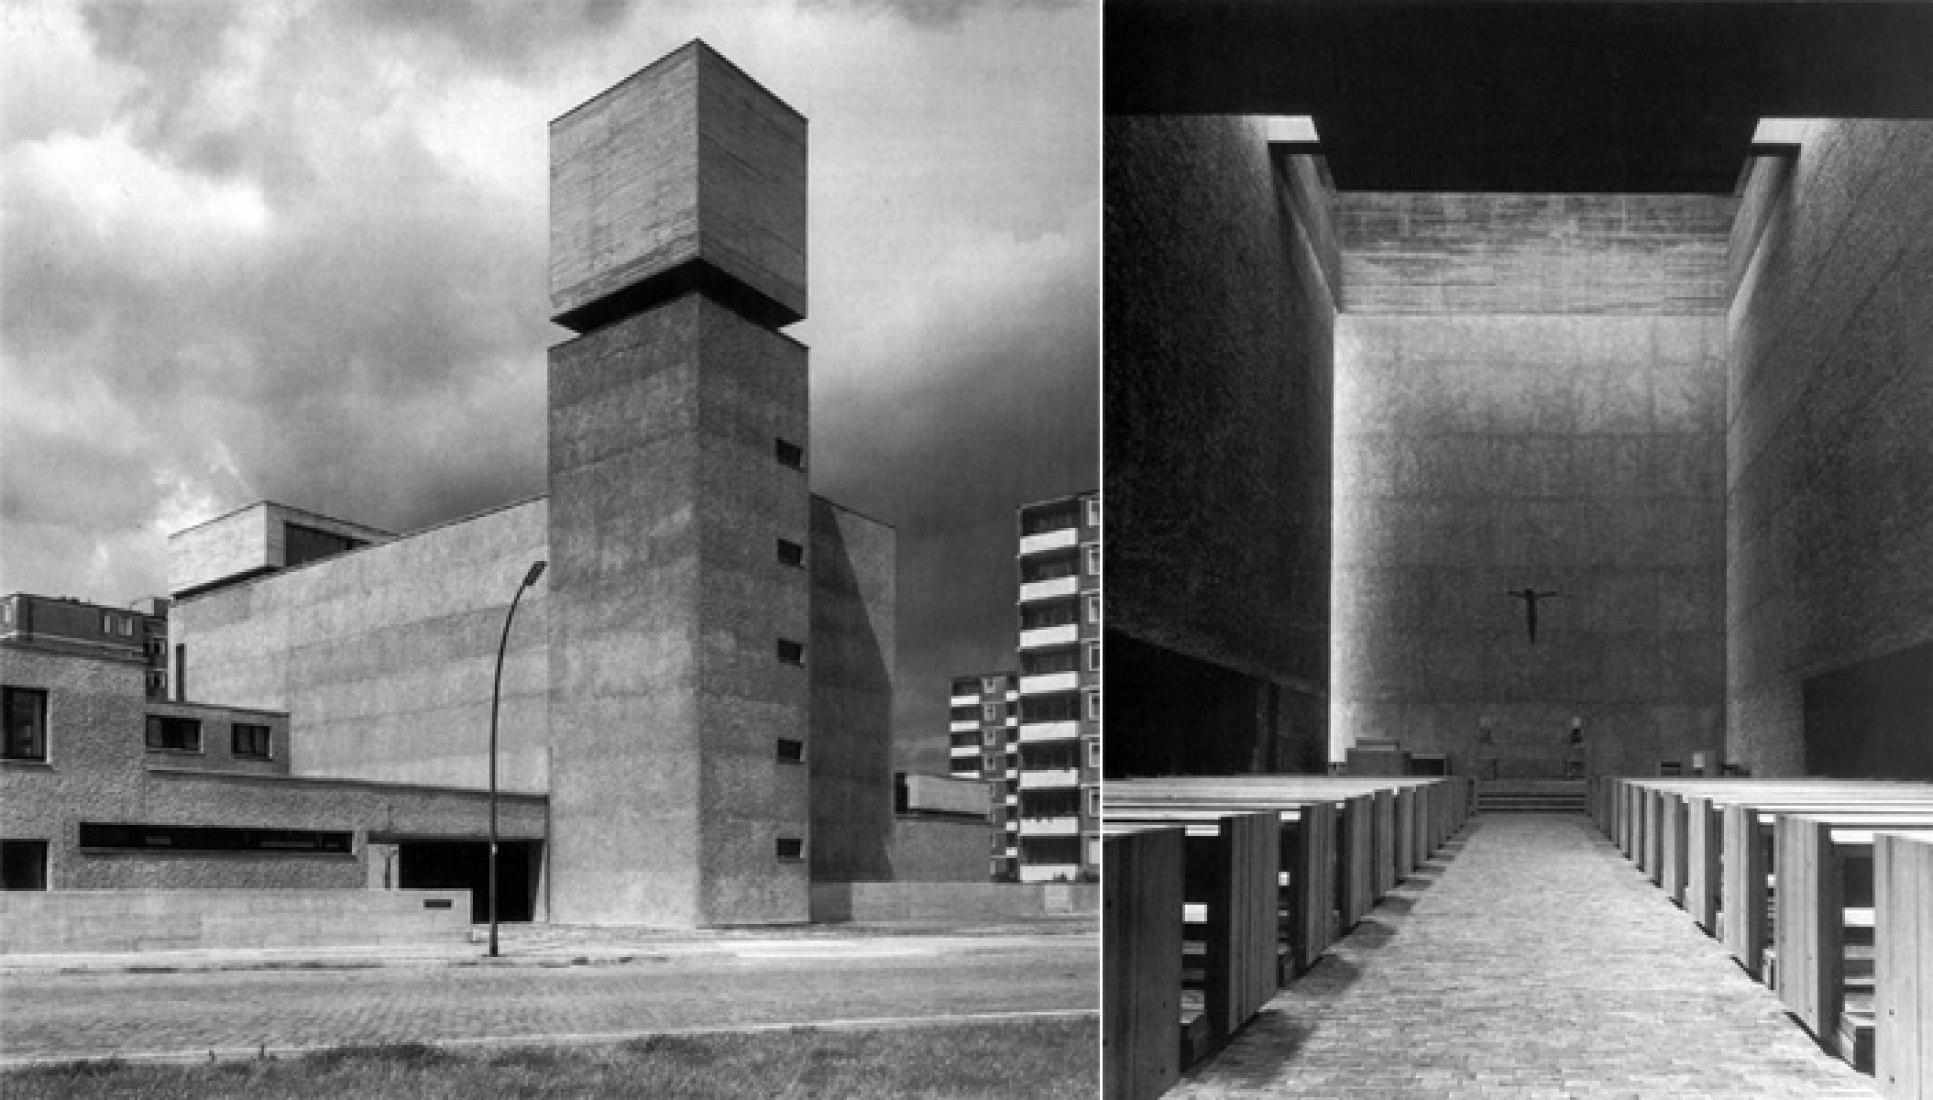 Werner Düttmann, St. Agnes Kirche, Berlin (1964-67), Haila Ochs, Werner Düttmann. Verliebt ins Bauen. Architekt für Berlin 1921 – 1983, Basel/Berlin/Boston 1990, S. 131, 12: S. 135.